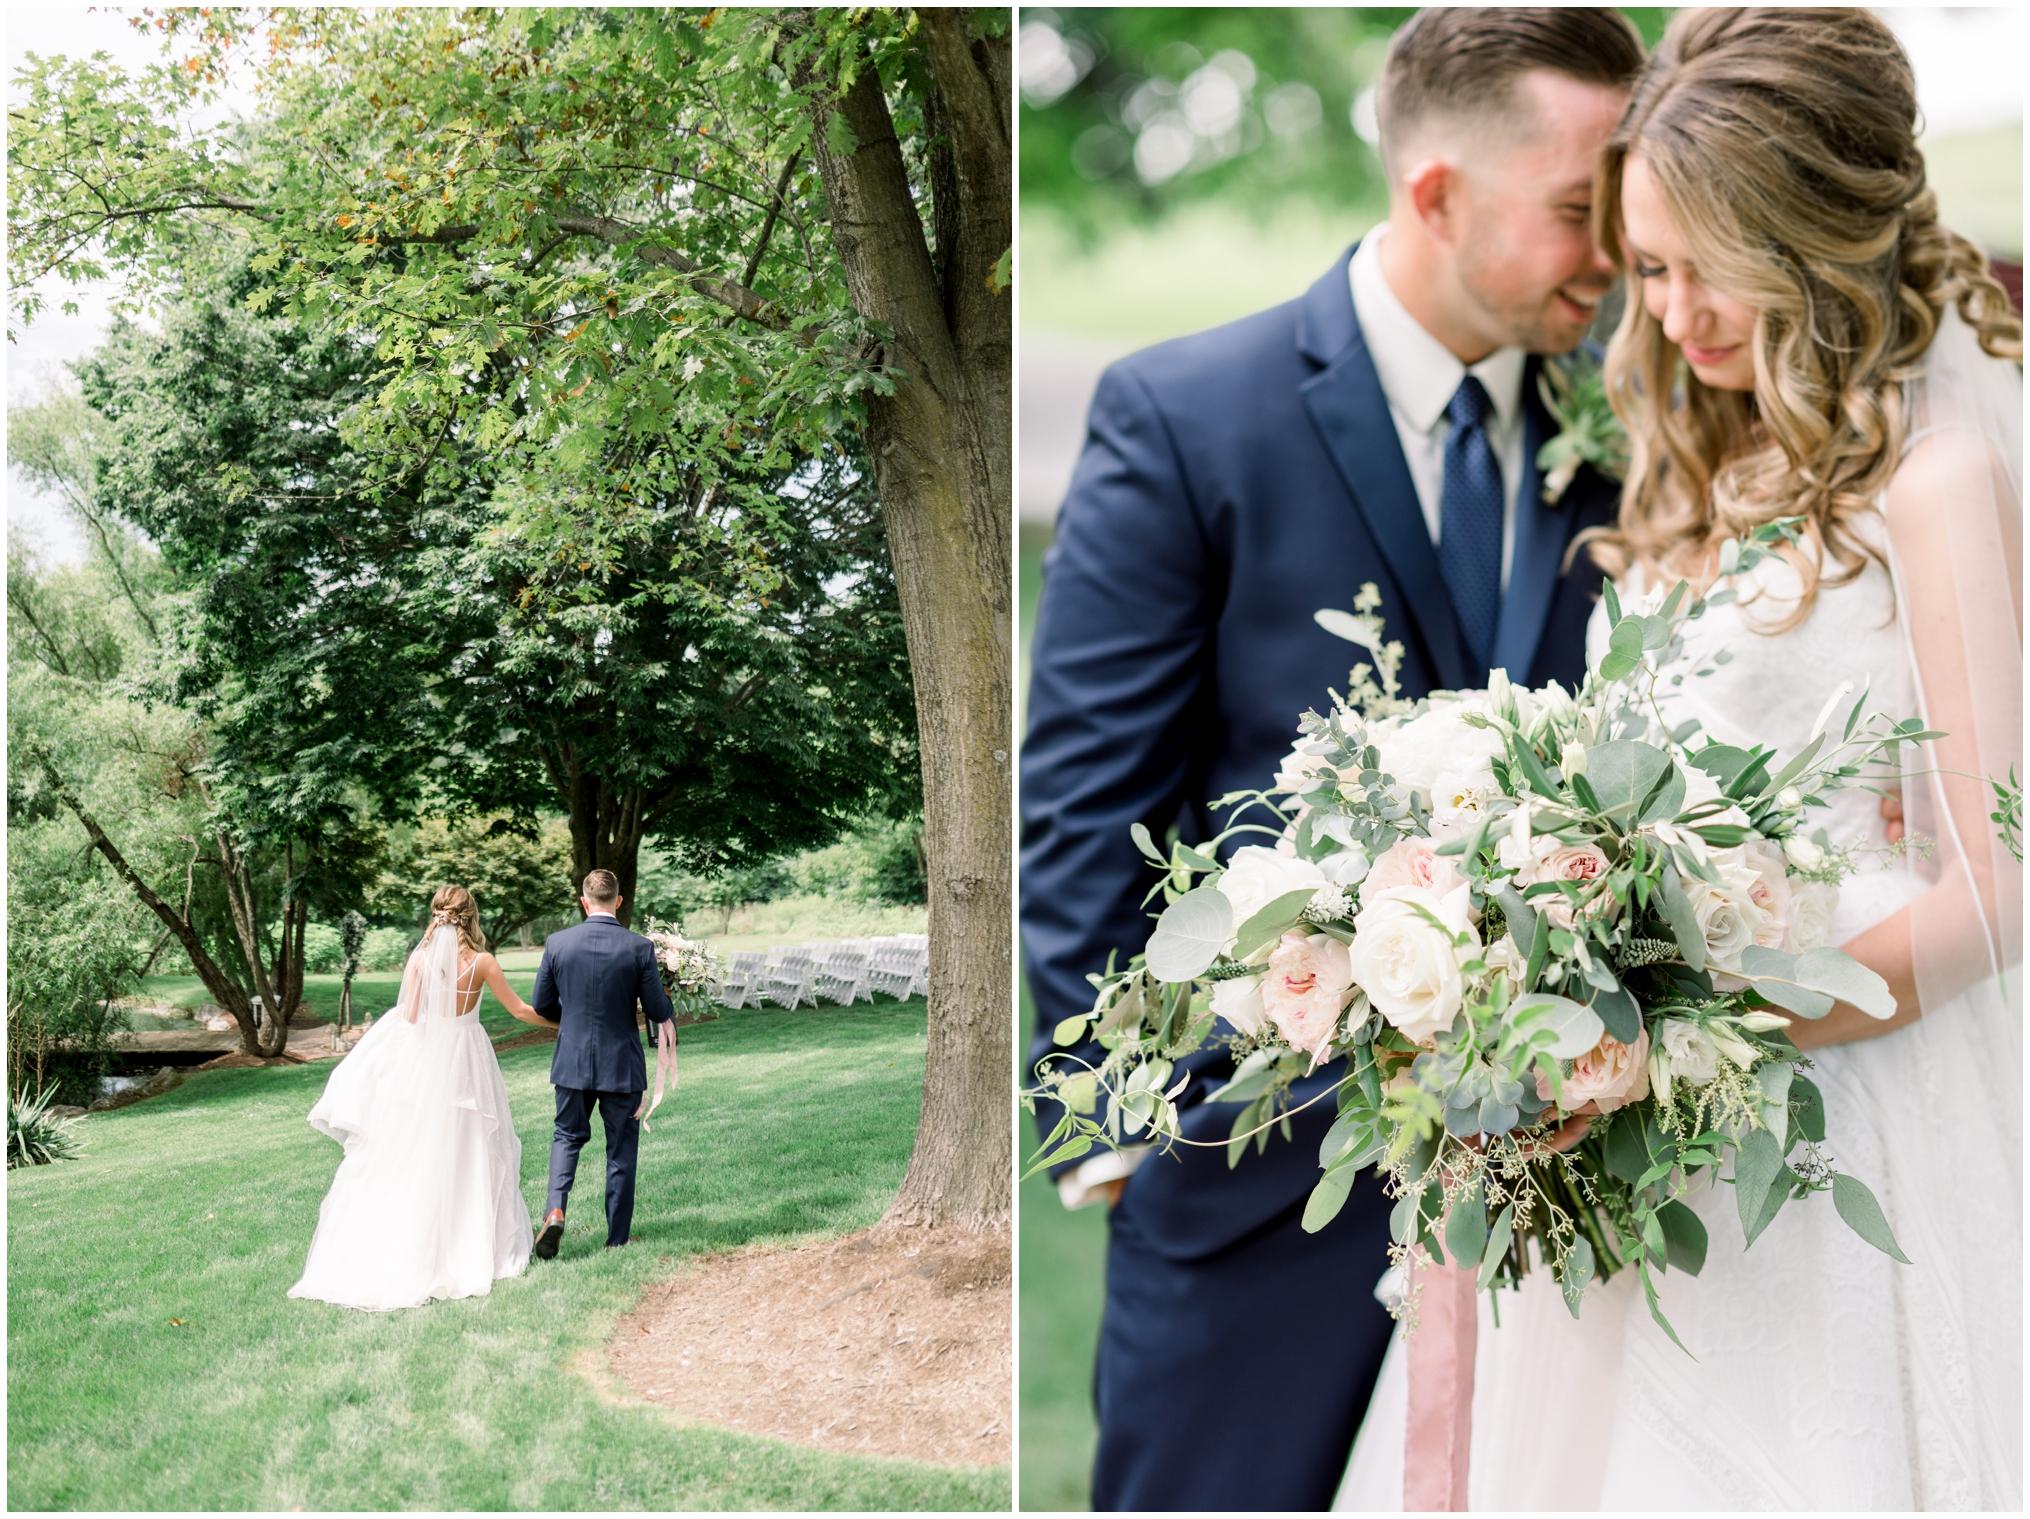 Krista Brackin Photography | July Wedding at The Farm at Eagle's Ridge_0013.jpg